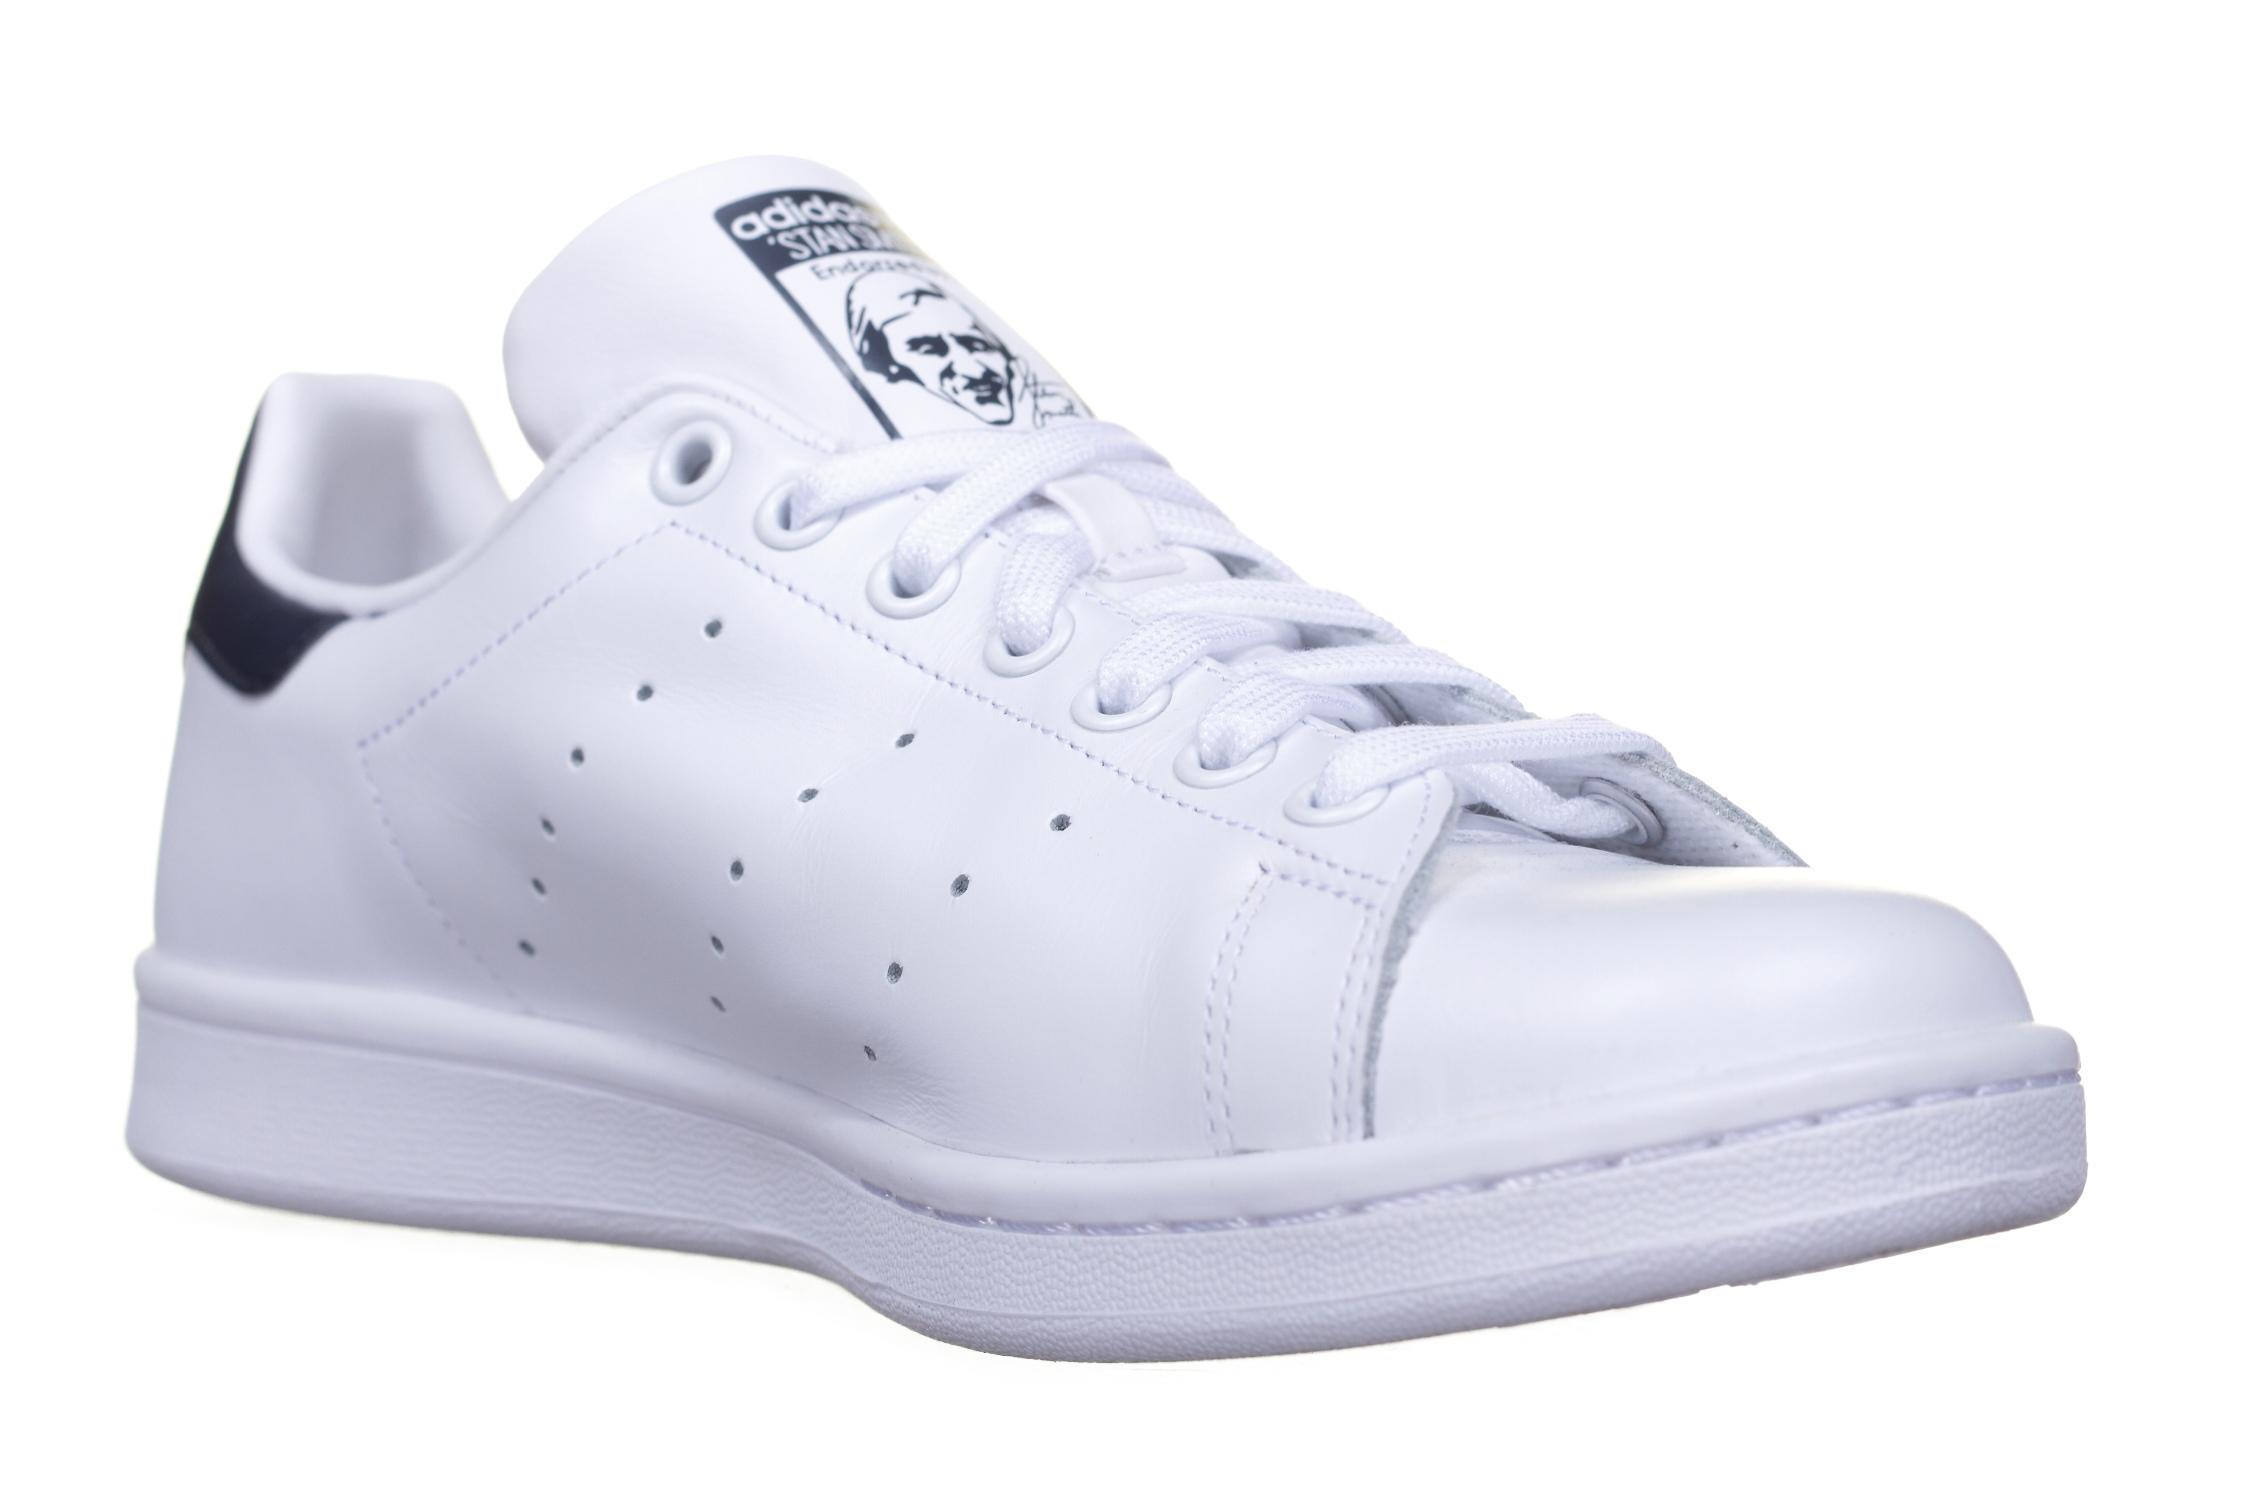 http://www.leadermode.com/78558/adidas-stan-smith-m20325-blanc-marine.jpg